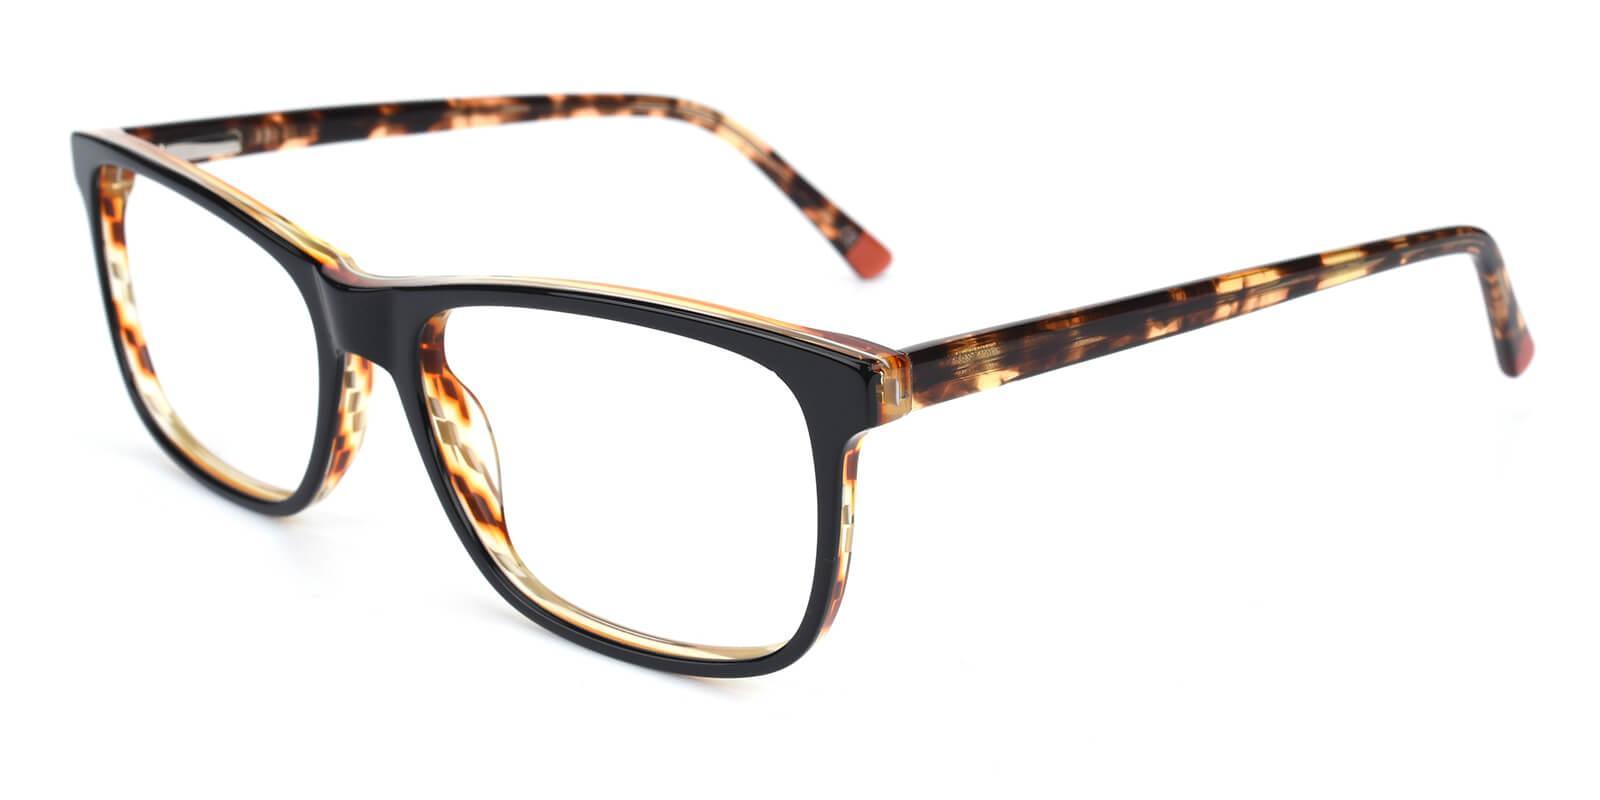 Chief-Tortoise-Rectangle-Acetate-Eyeglasses-additional1